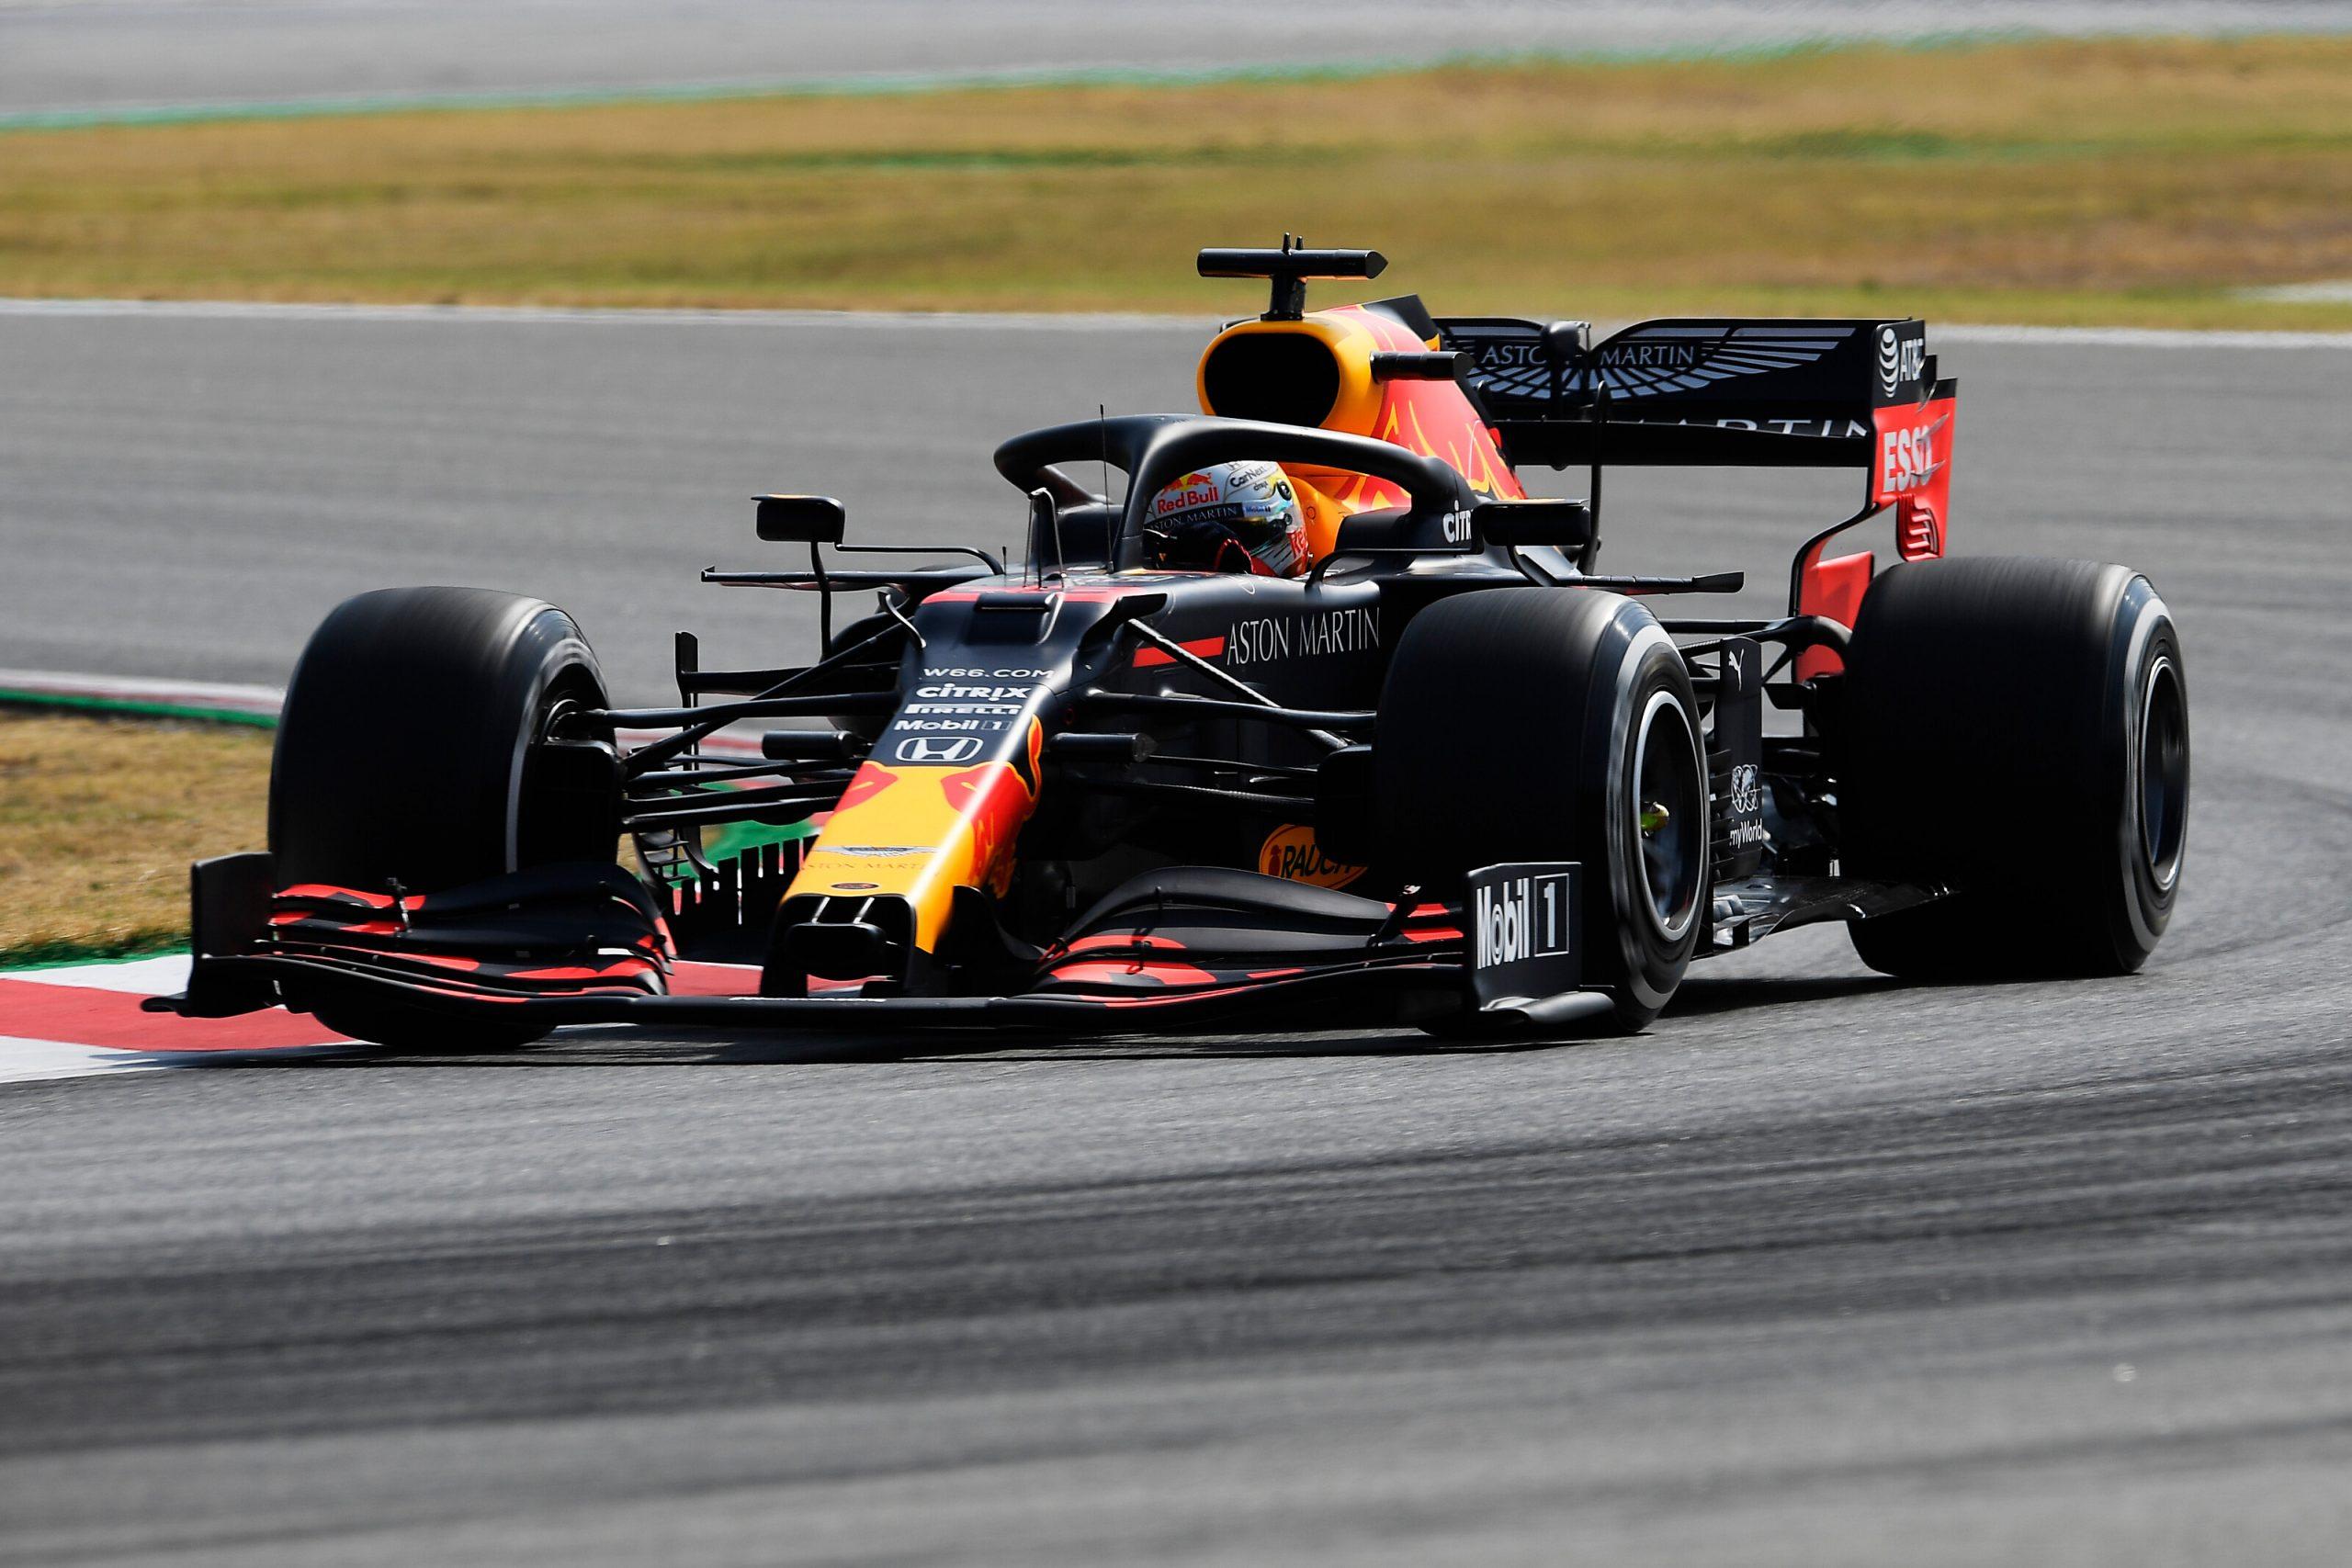 1e vrije training van de GP van Spanje 2020